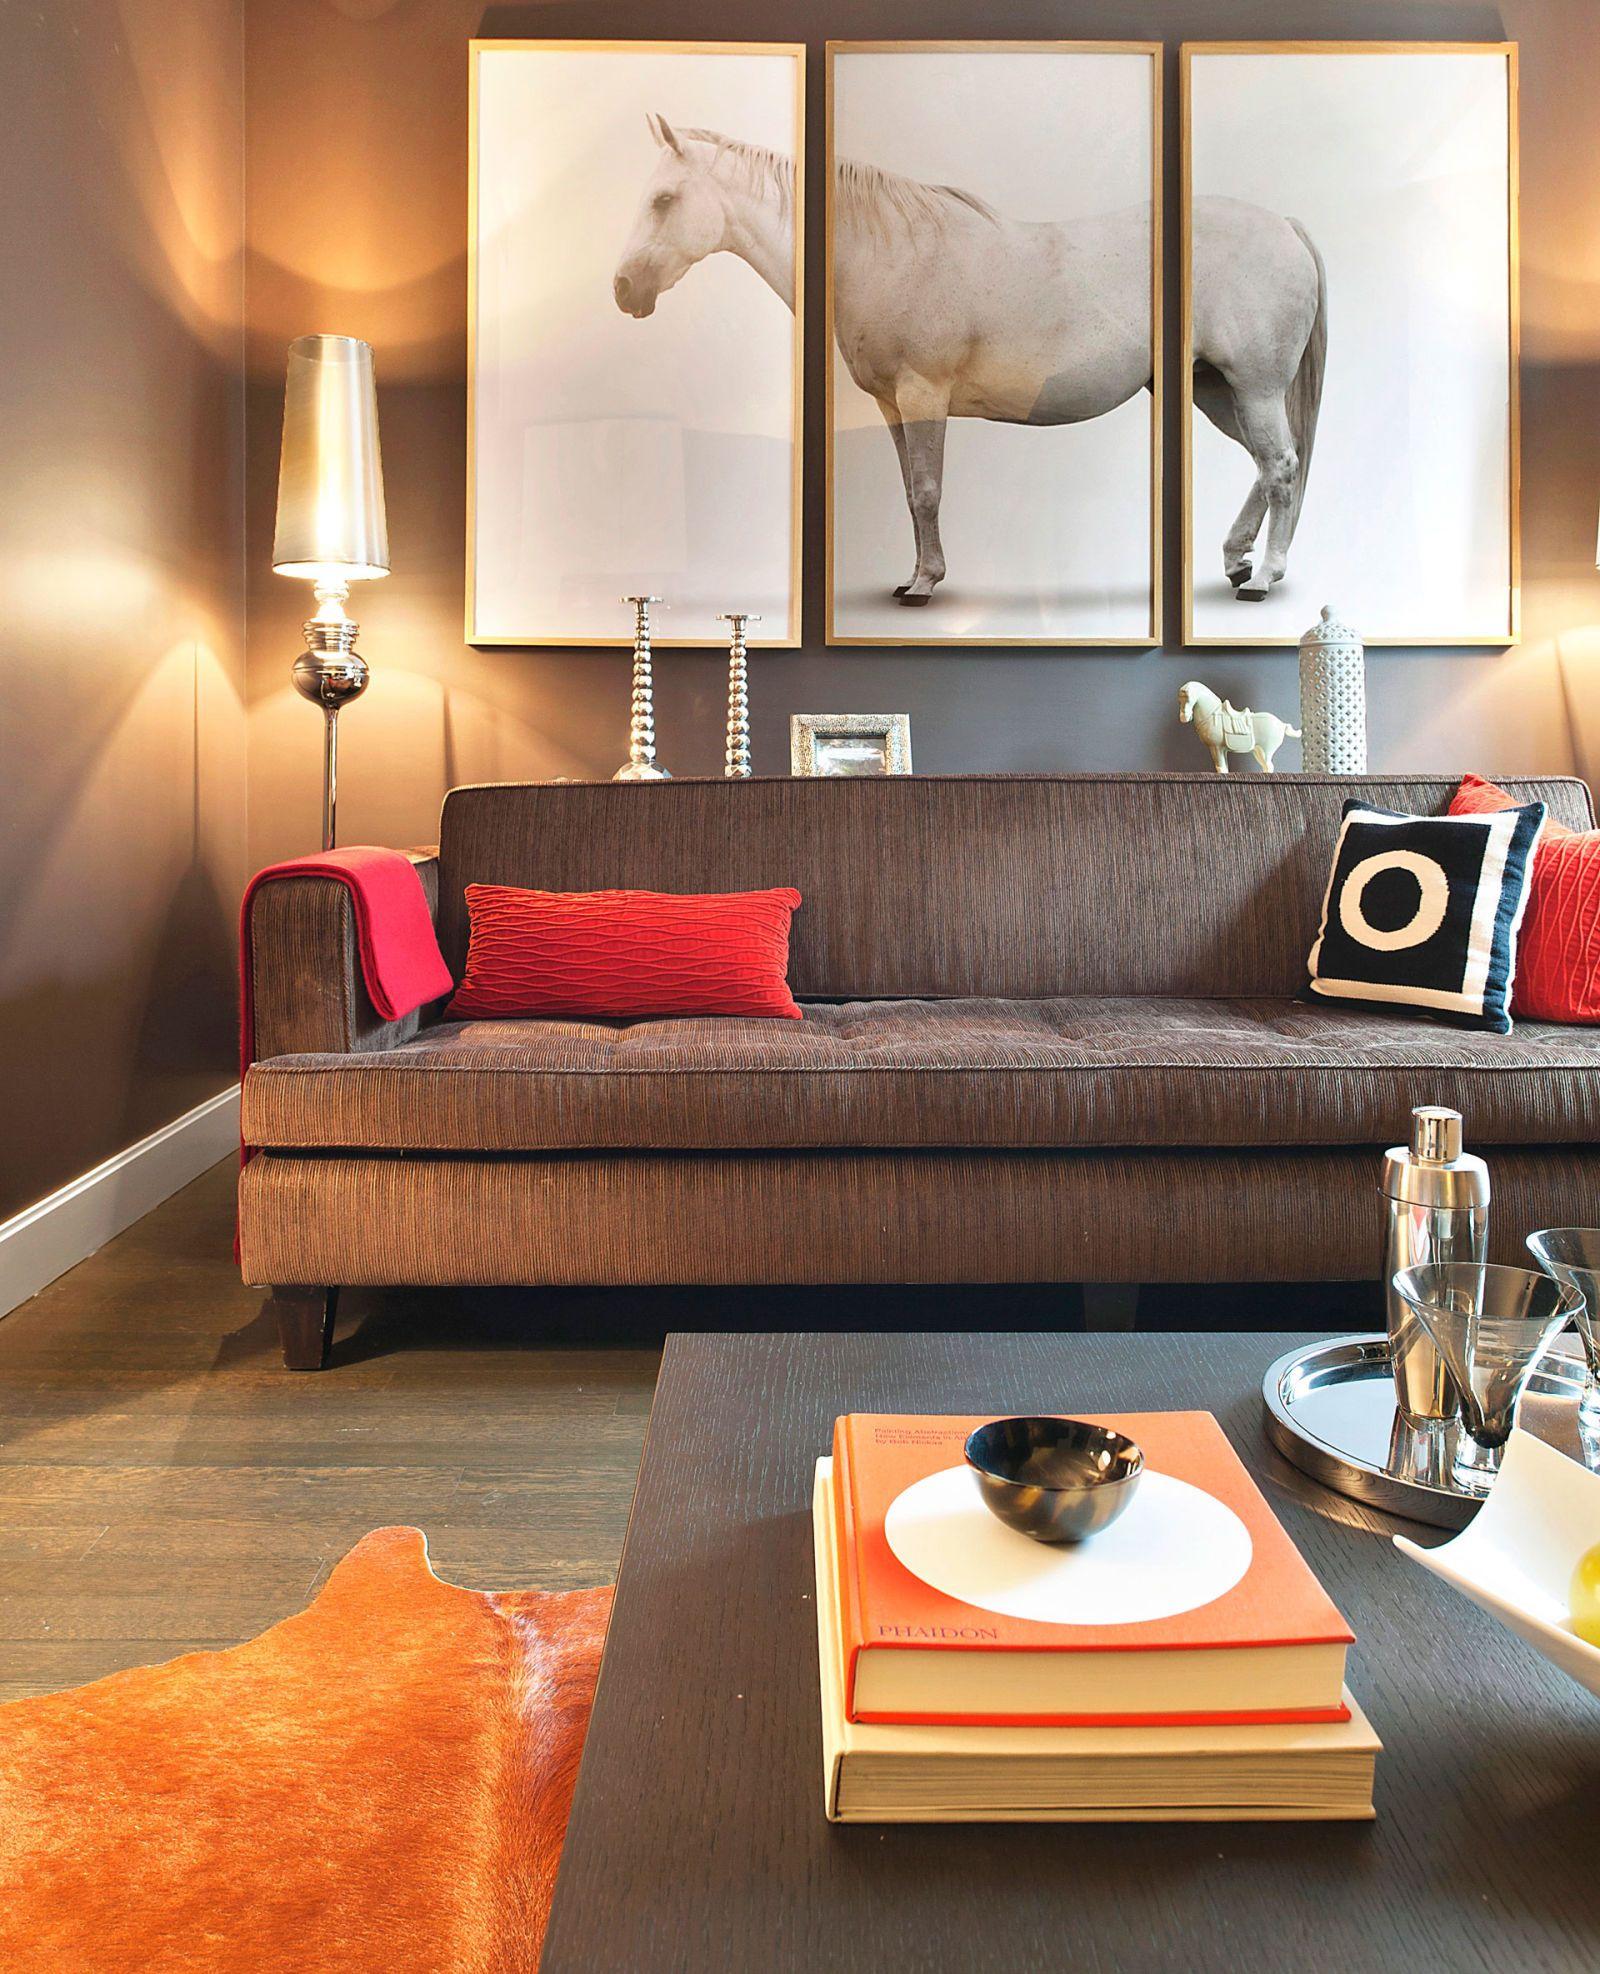 Wonderful 9 Cheap Ways To Make Your Home Look Like A Million Bucks